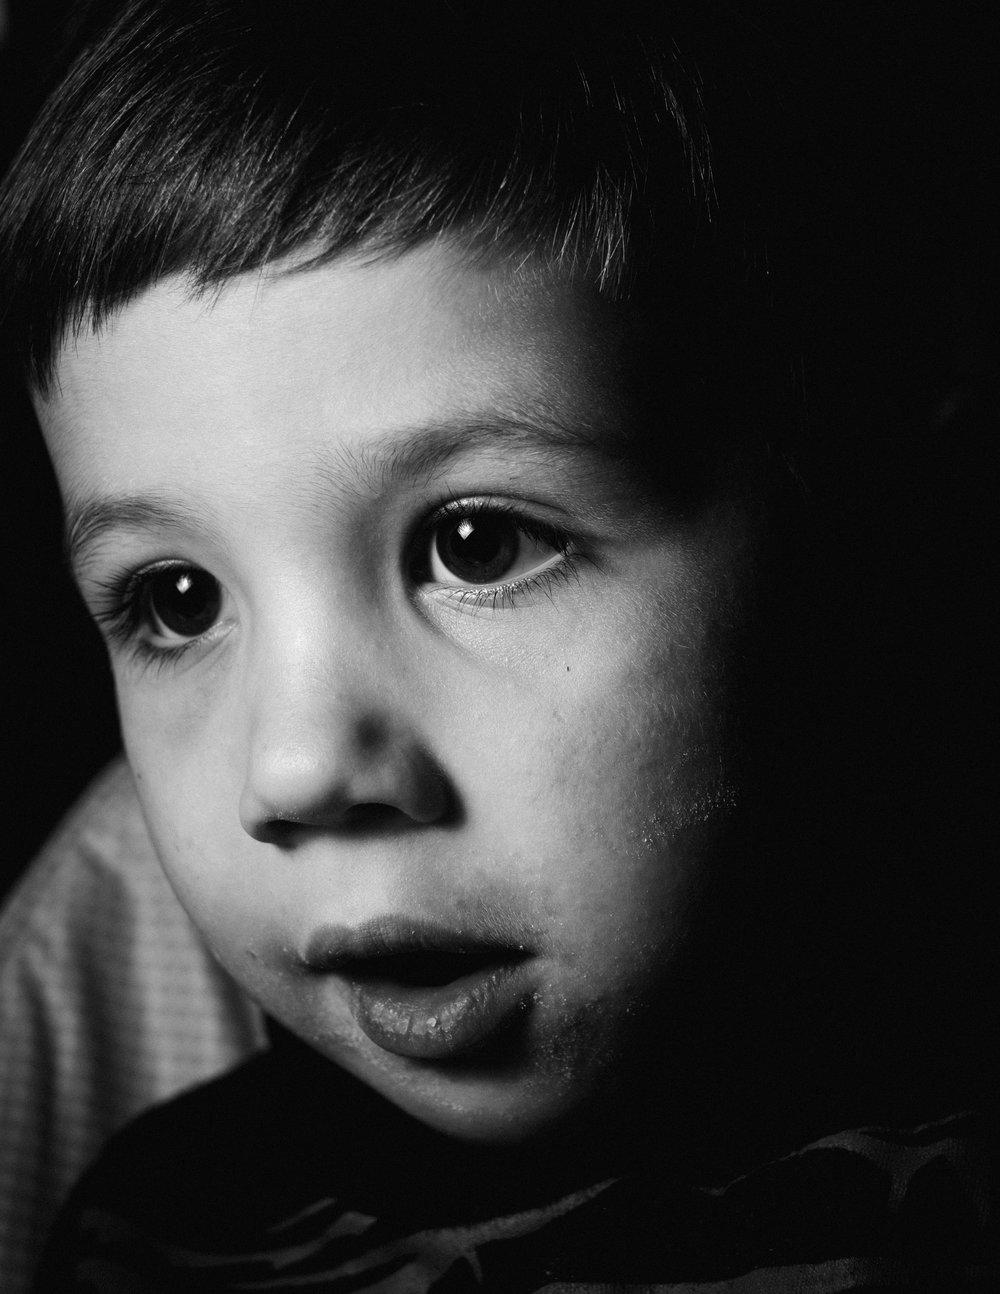 My son, age 4.